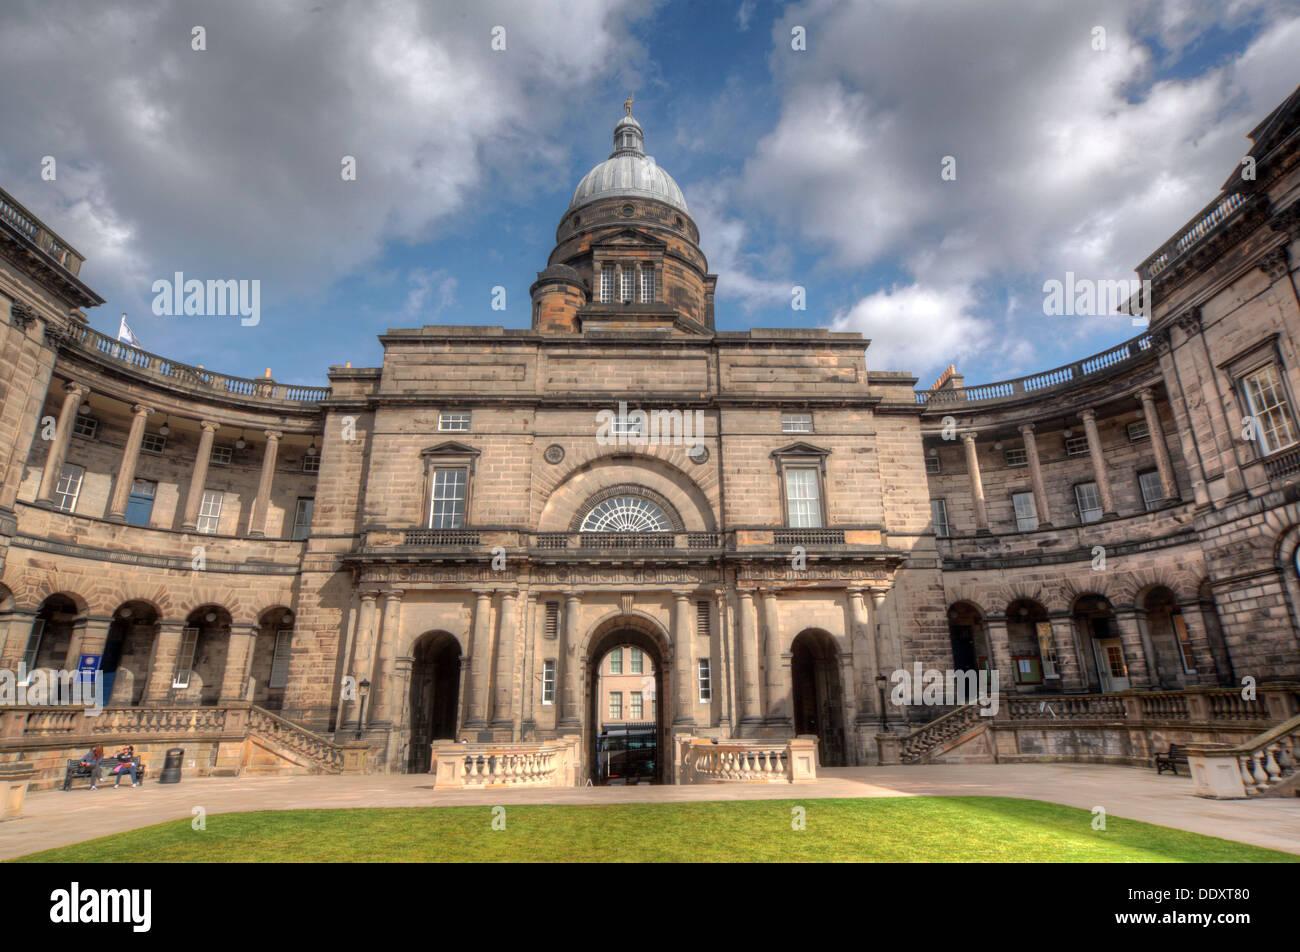 Tower/dome at Edinburgh University South College Lothian Scotland UK wide view - Stock Image